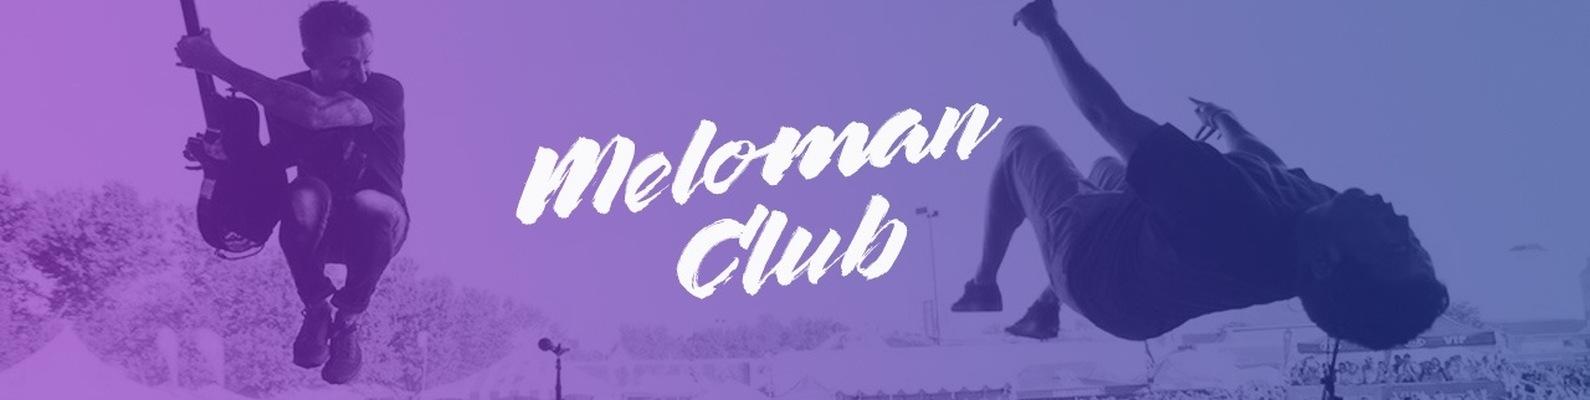 Melomanclub | ВКонтакте